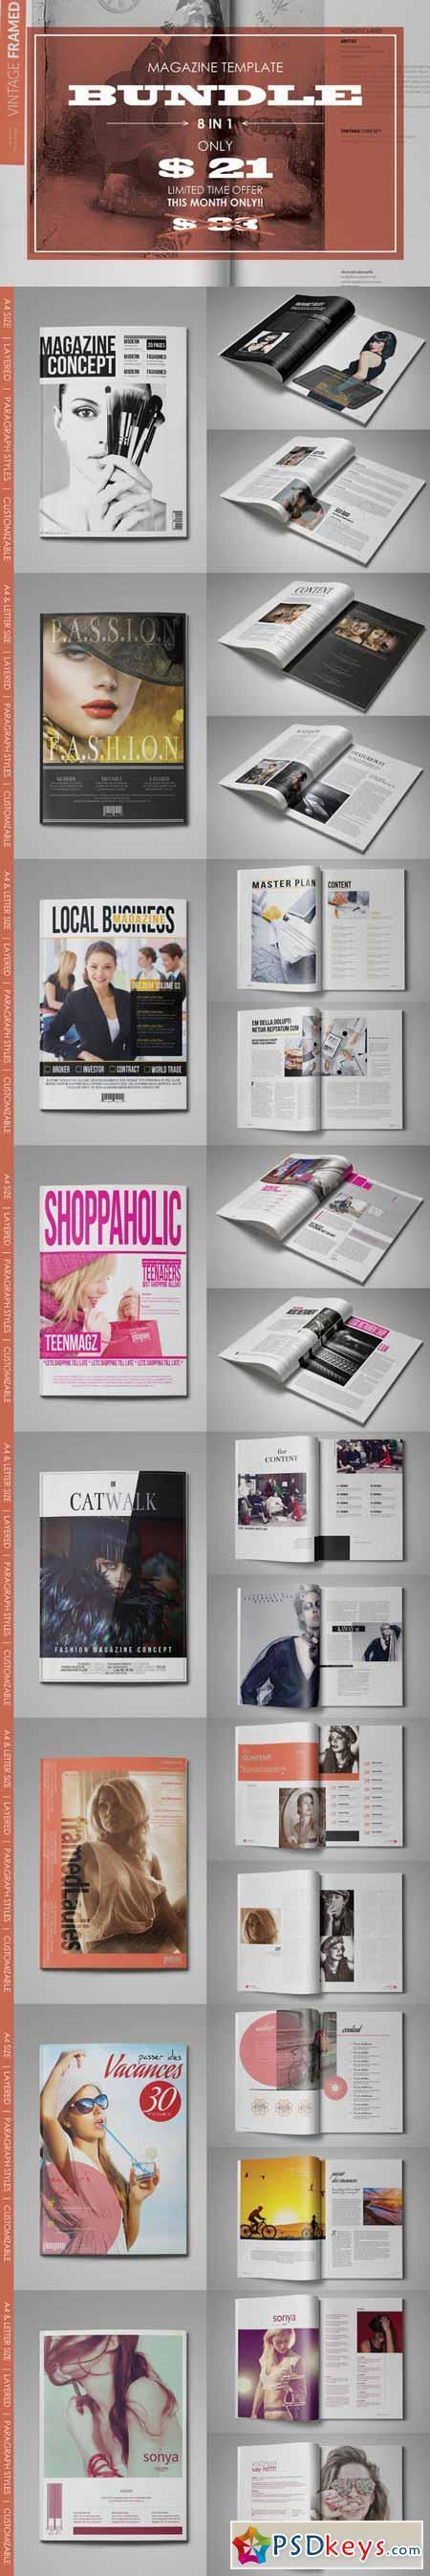 Magazine Bundle Vol. 2 558635